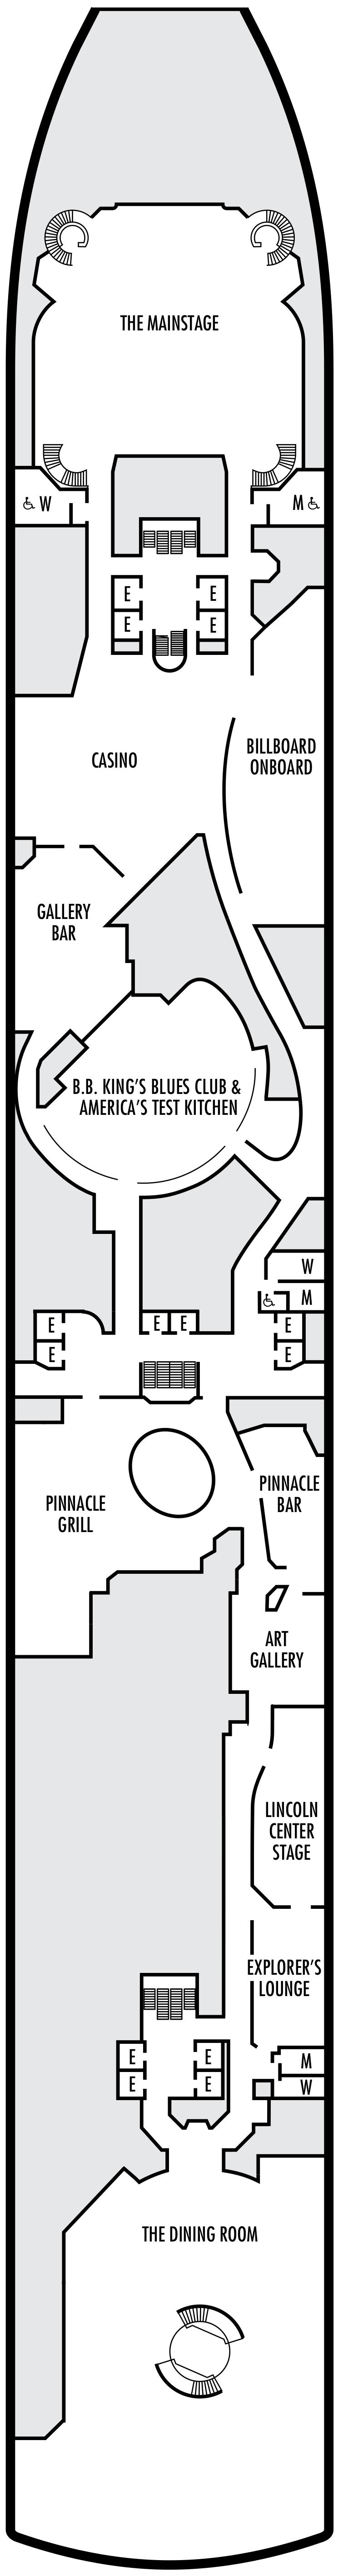 Westerdam Lower Promenade Deck Plan